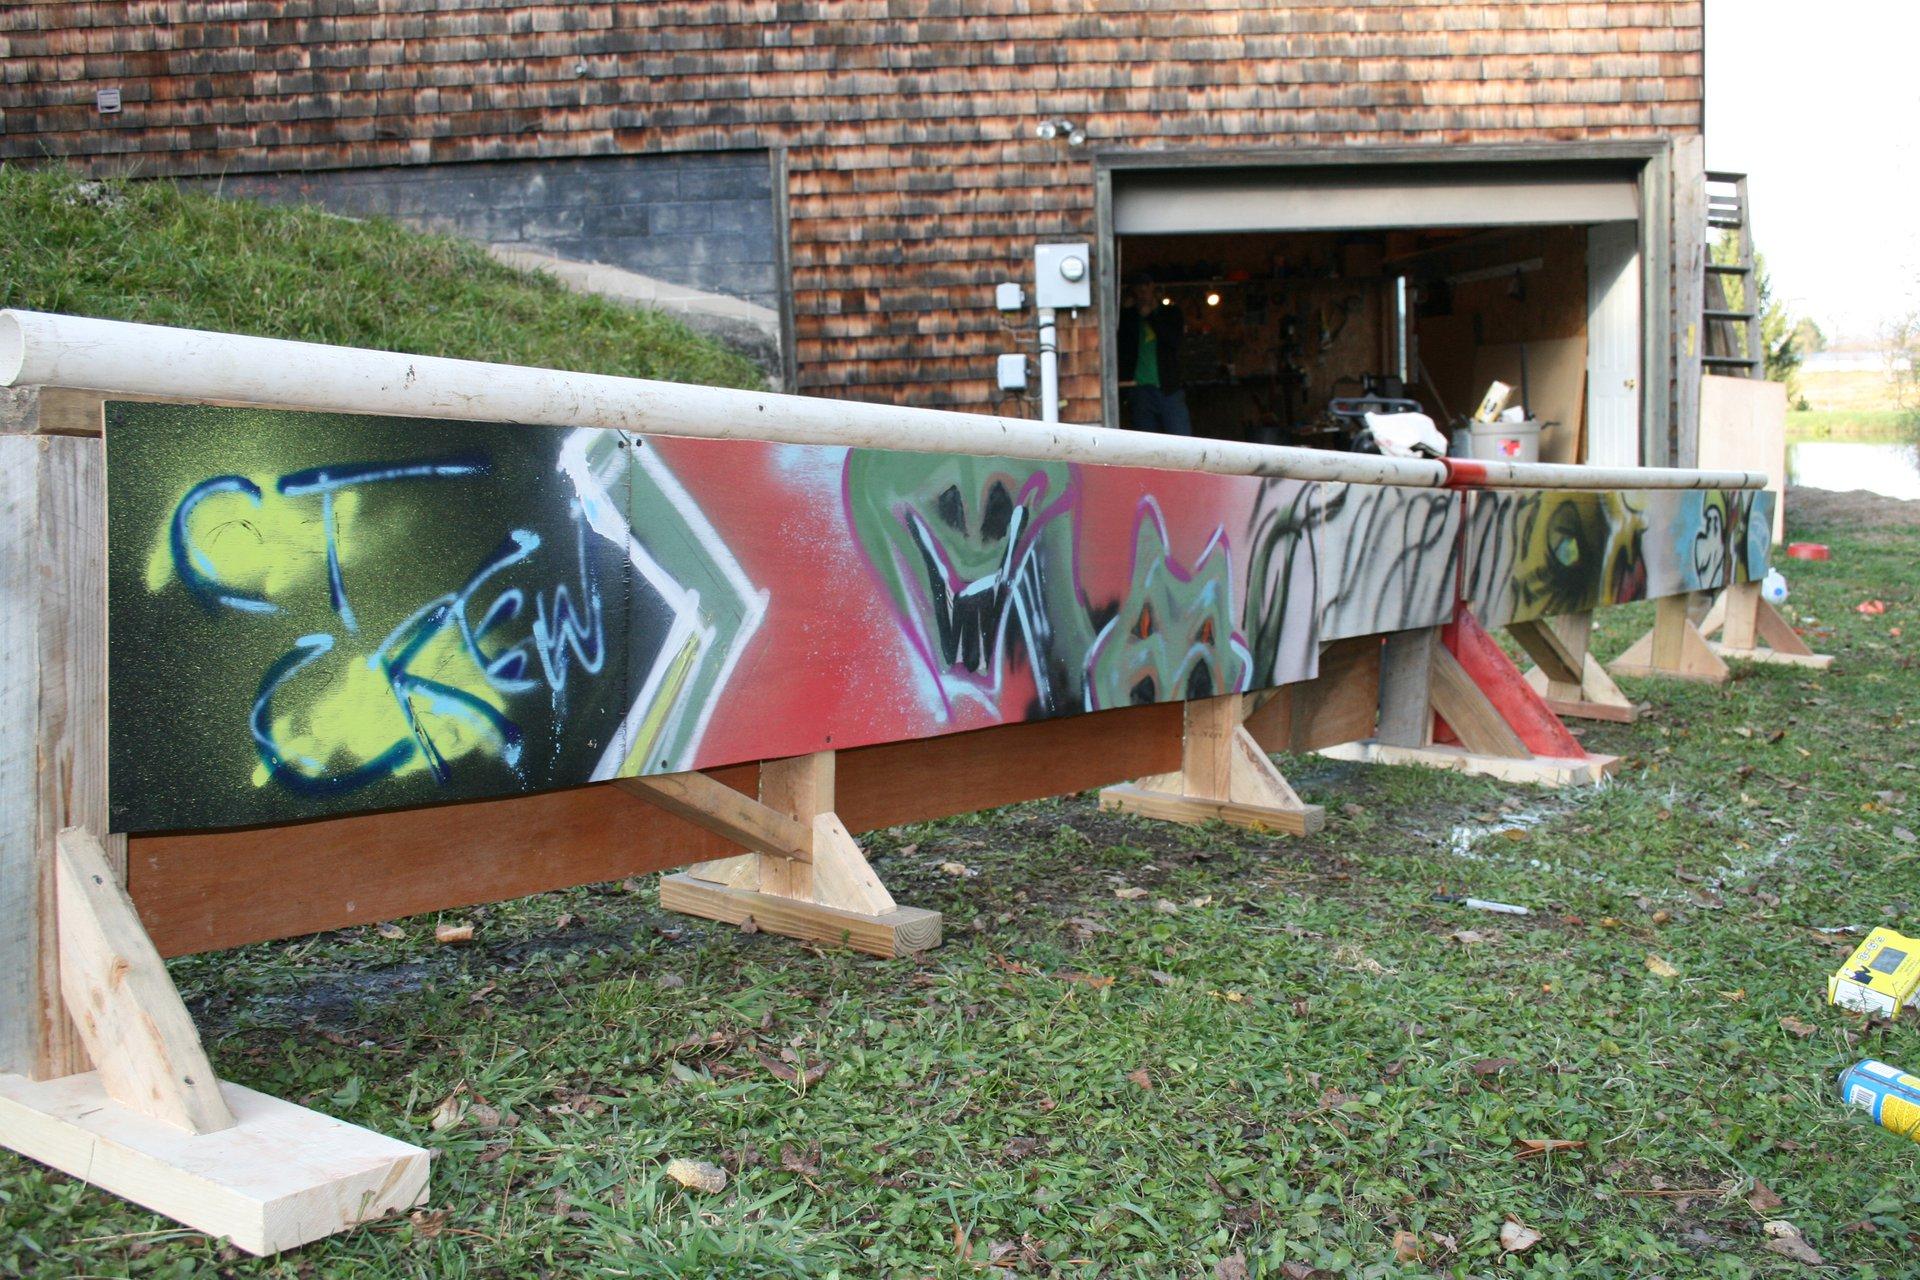 Dope rail 1